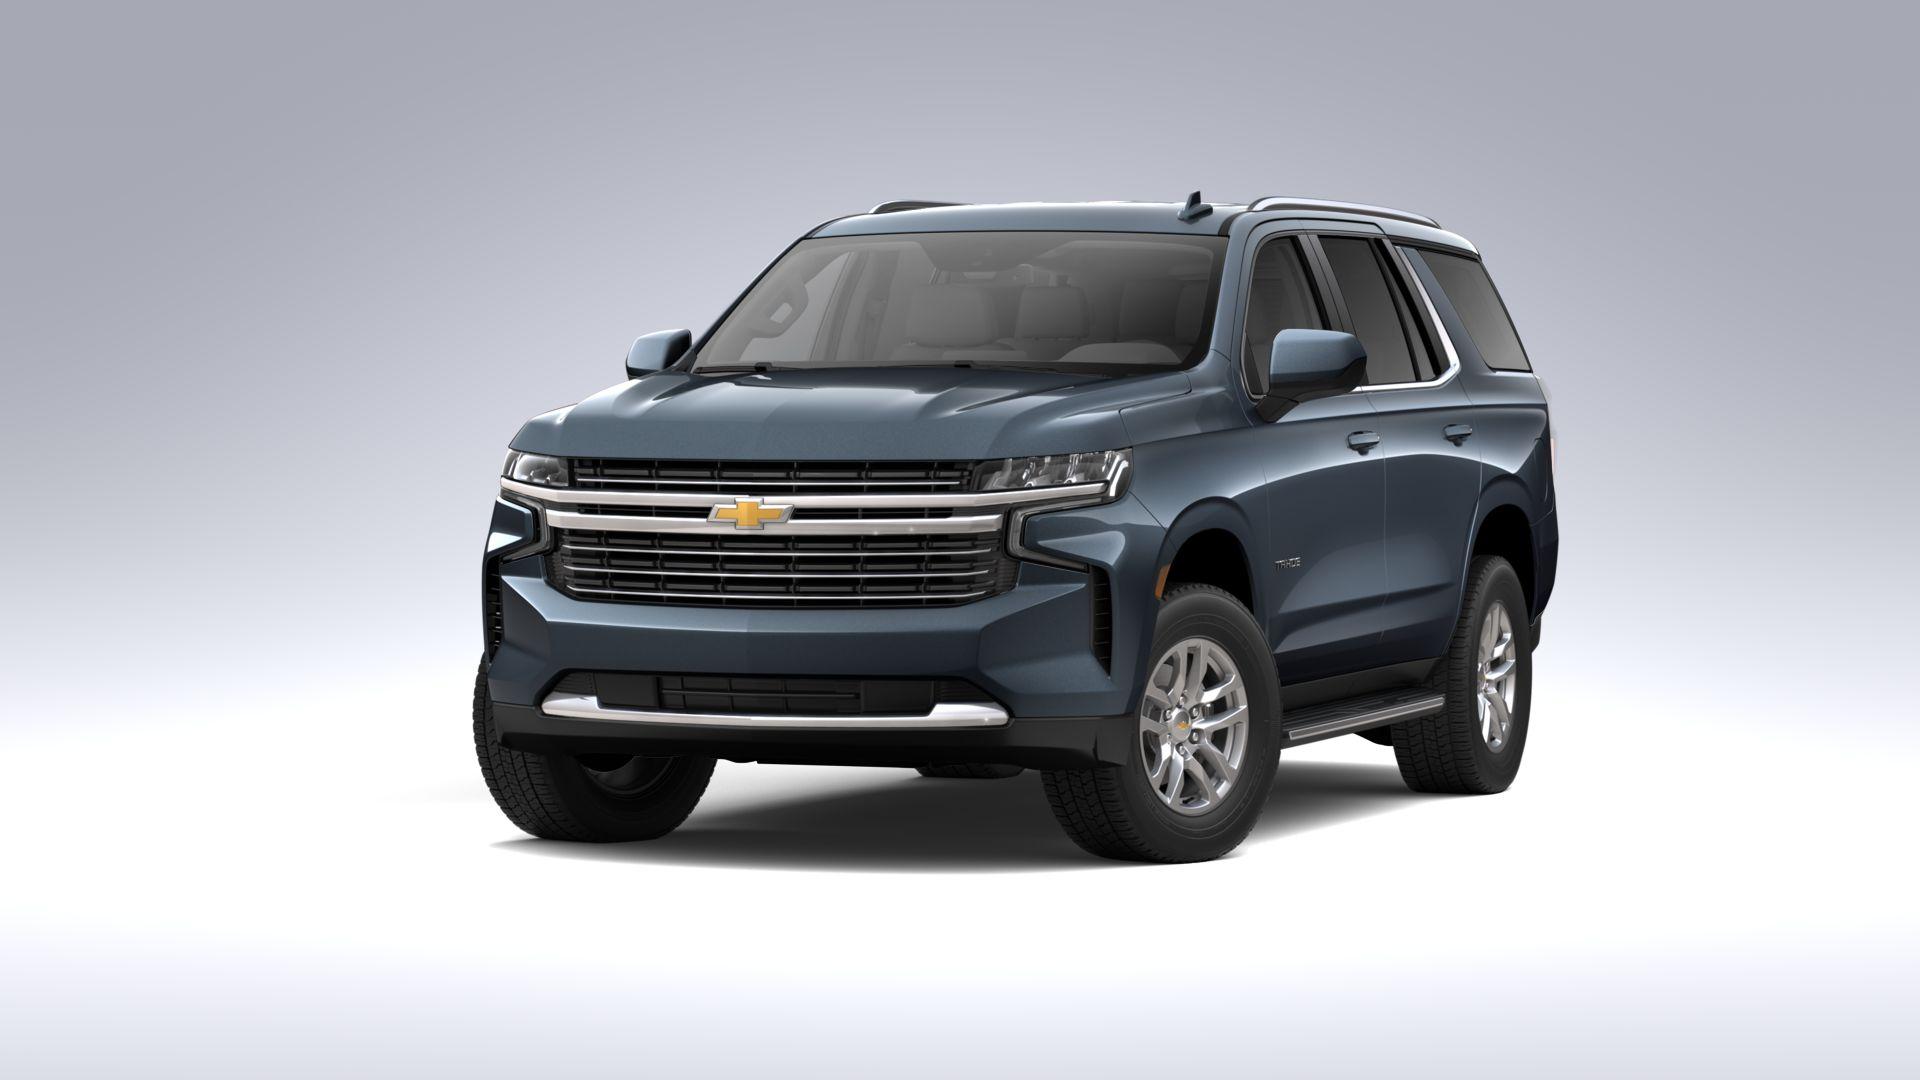 New 2021 Chevrolet Tahoe LT FOUR WHEEL DRIVE SUV